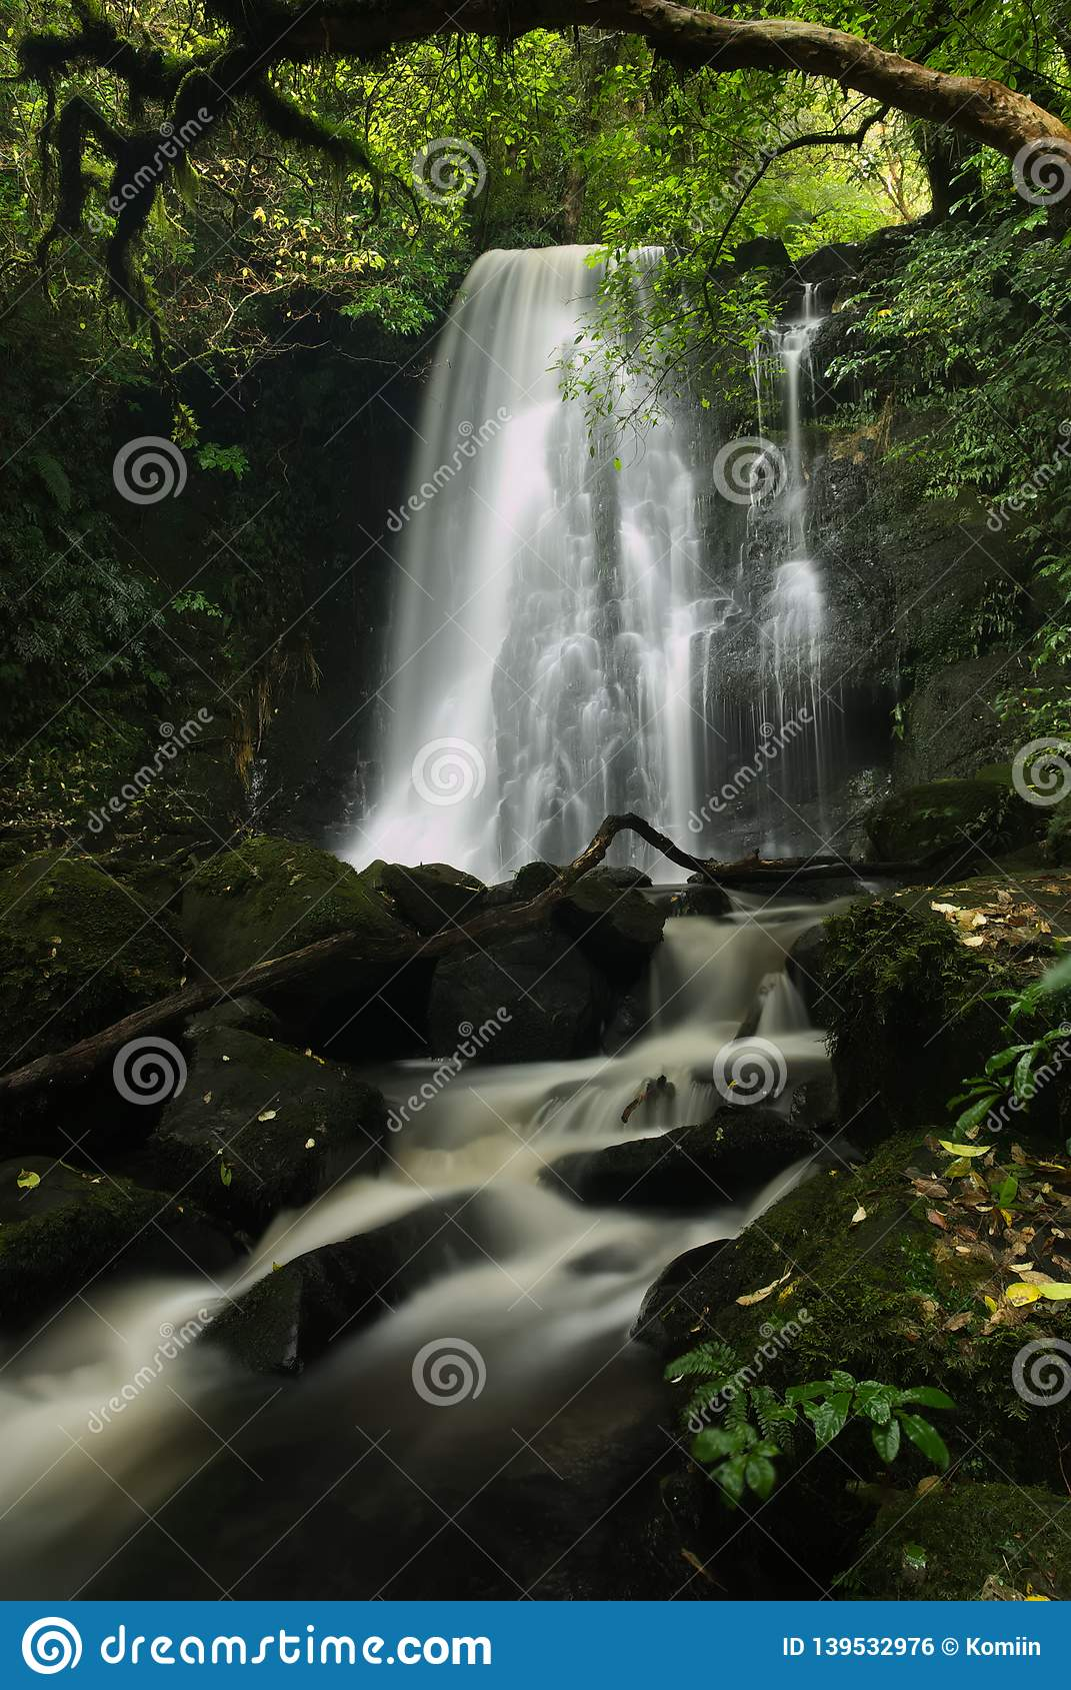 在Catlins的Matai瀑布